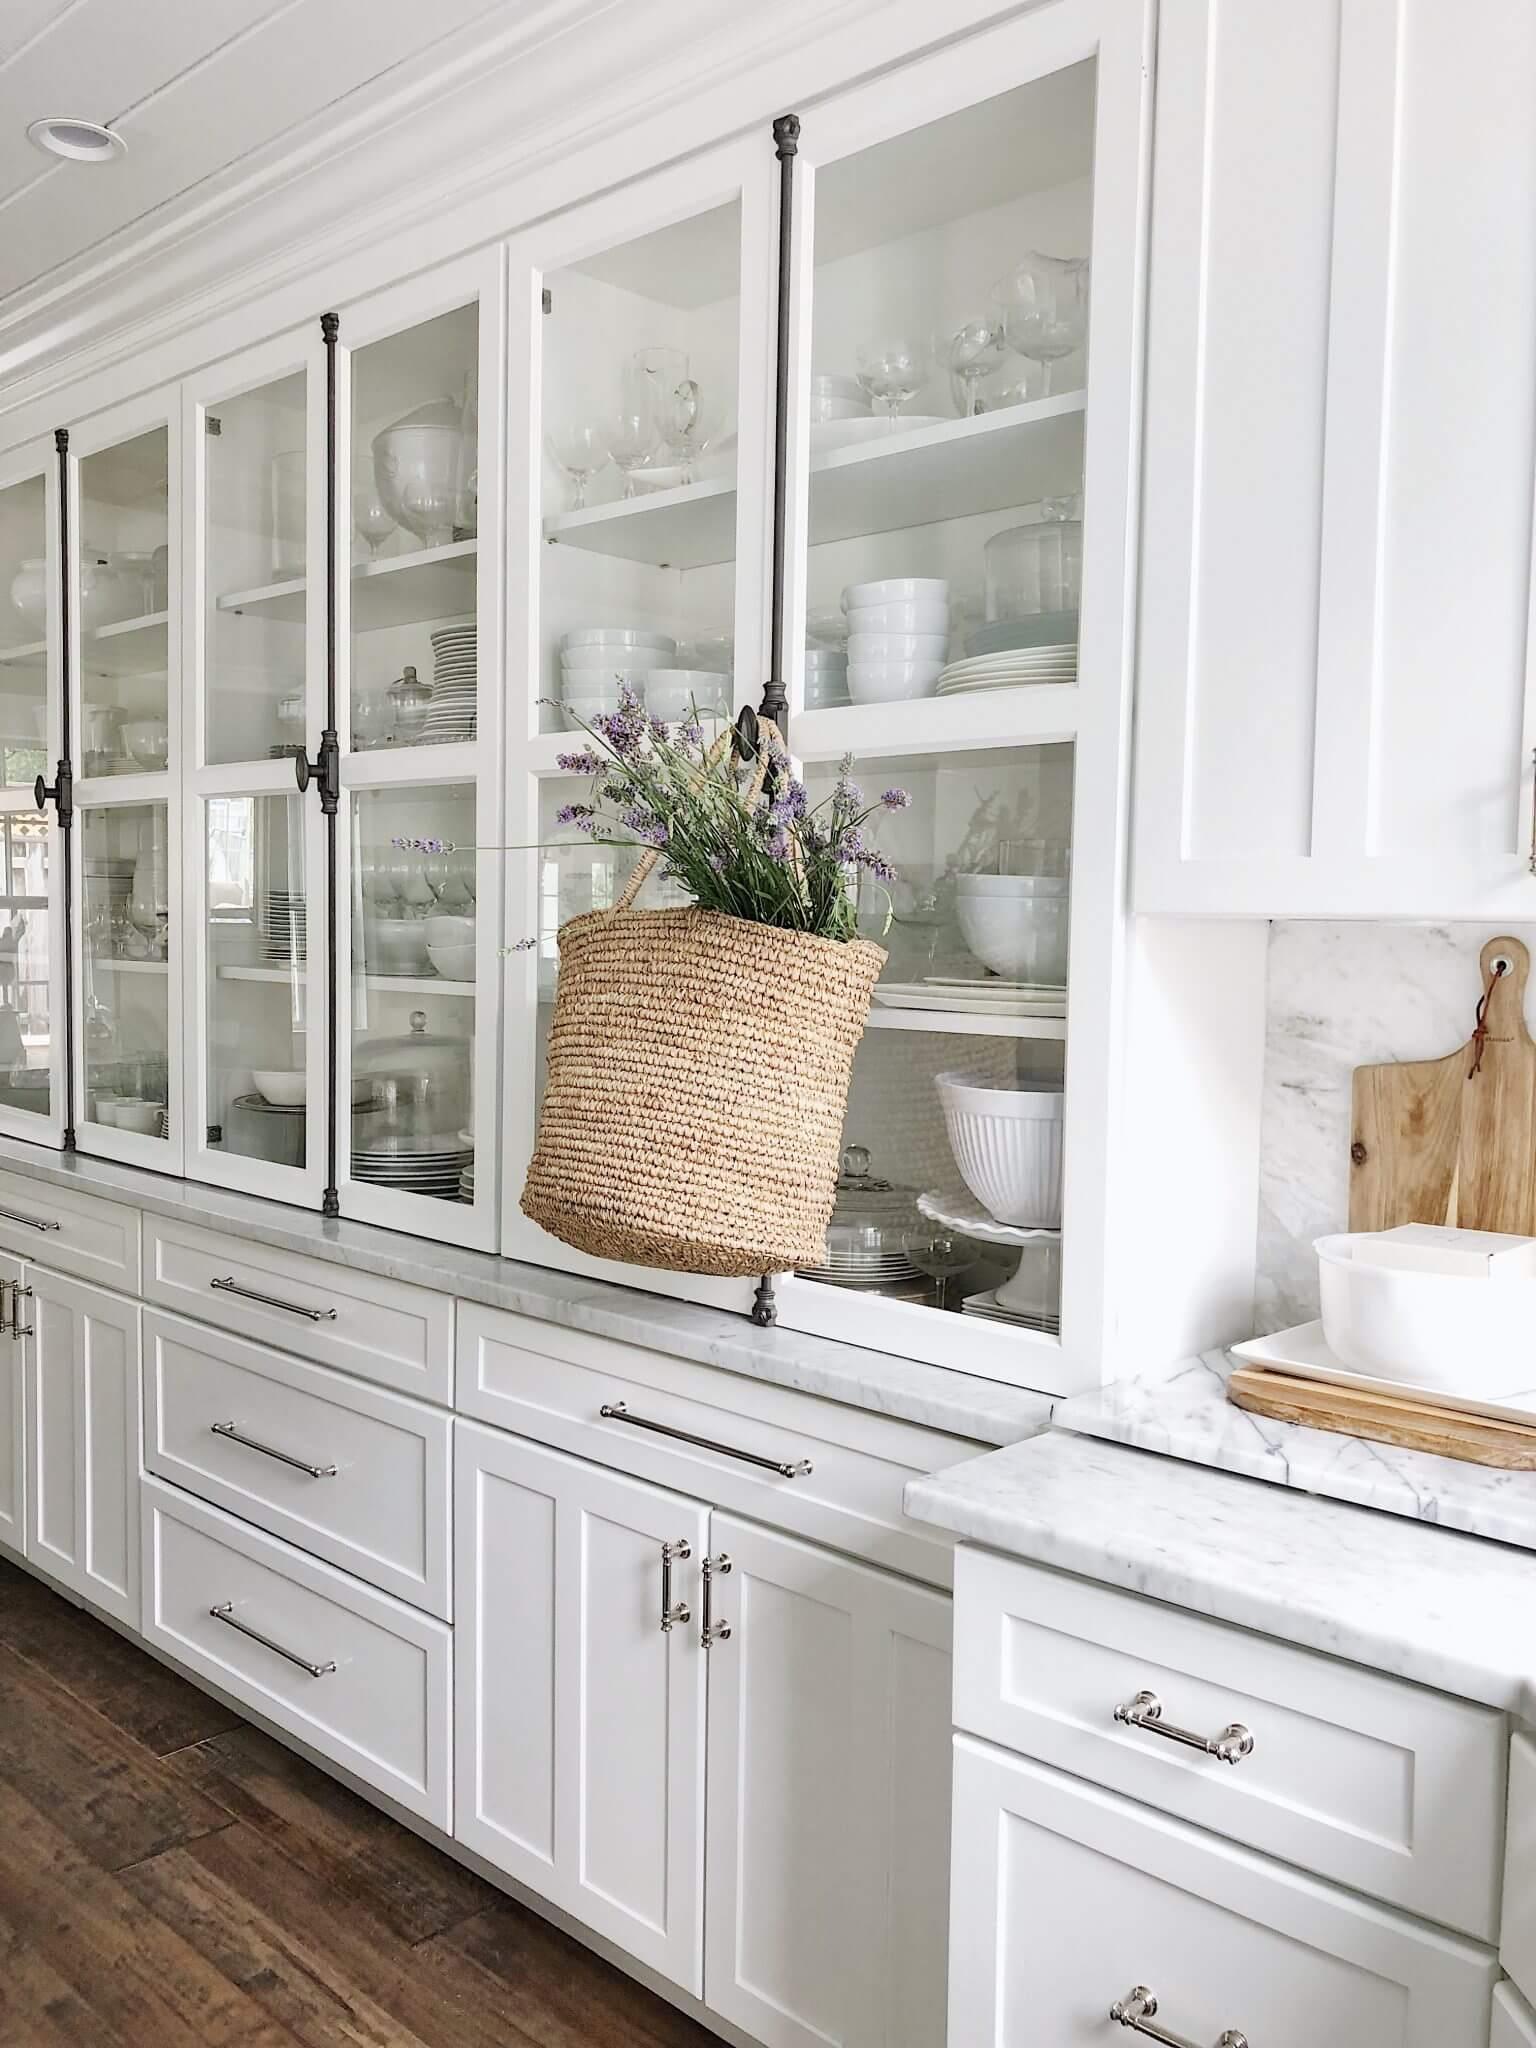 Featherglass Glass Door Kitchen Cabinets hanging market basket